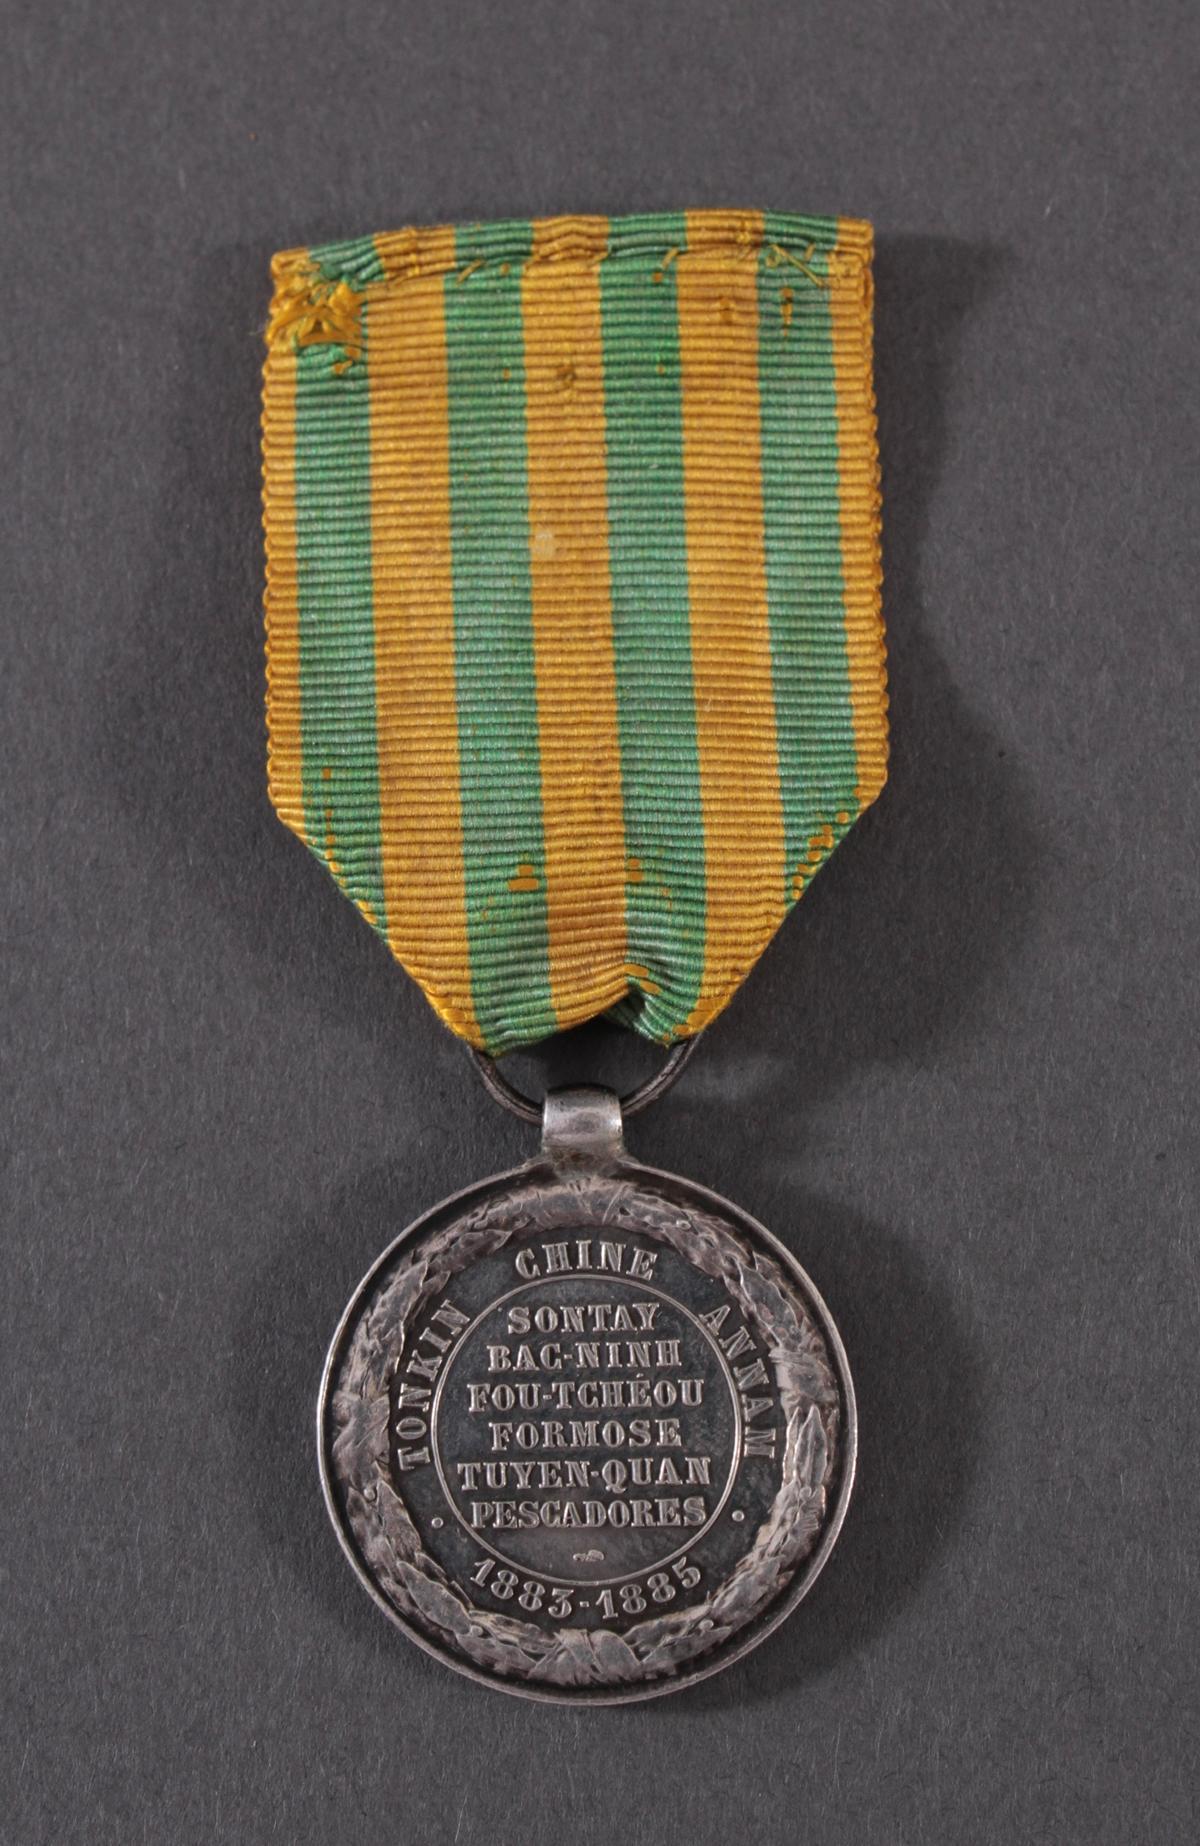 Tonkin Expeditionserinnerungsmedaille CAU-GIAI 1885-2